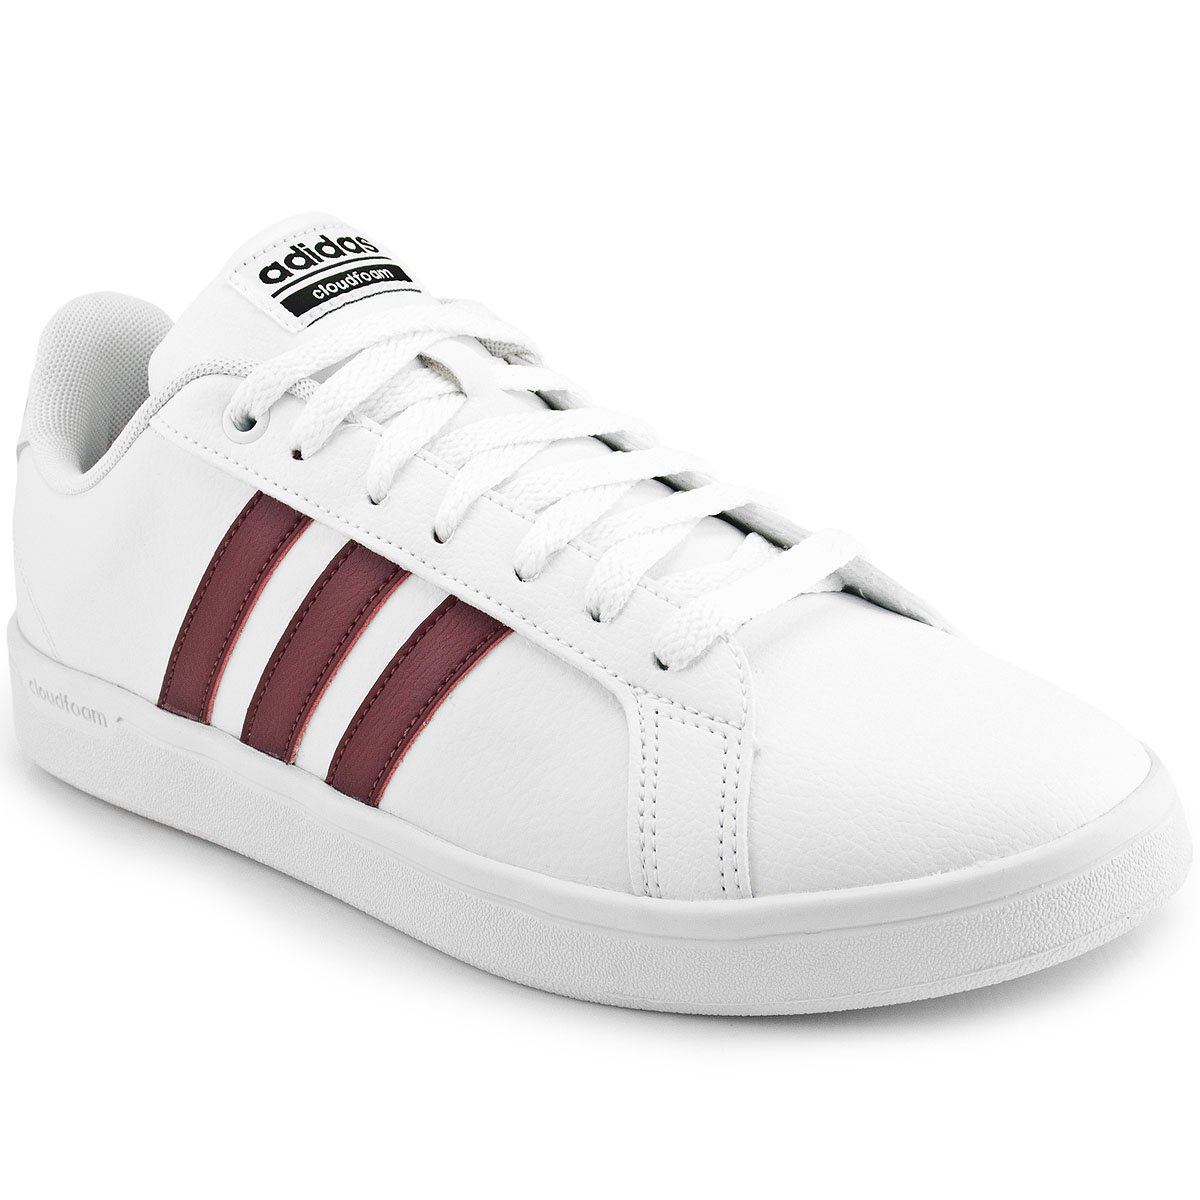 69d2af372 Tênis Adidas CF Advantage Clean Masculino | Casual | MaxTennis